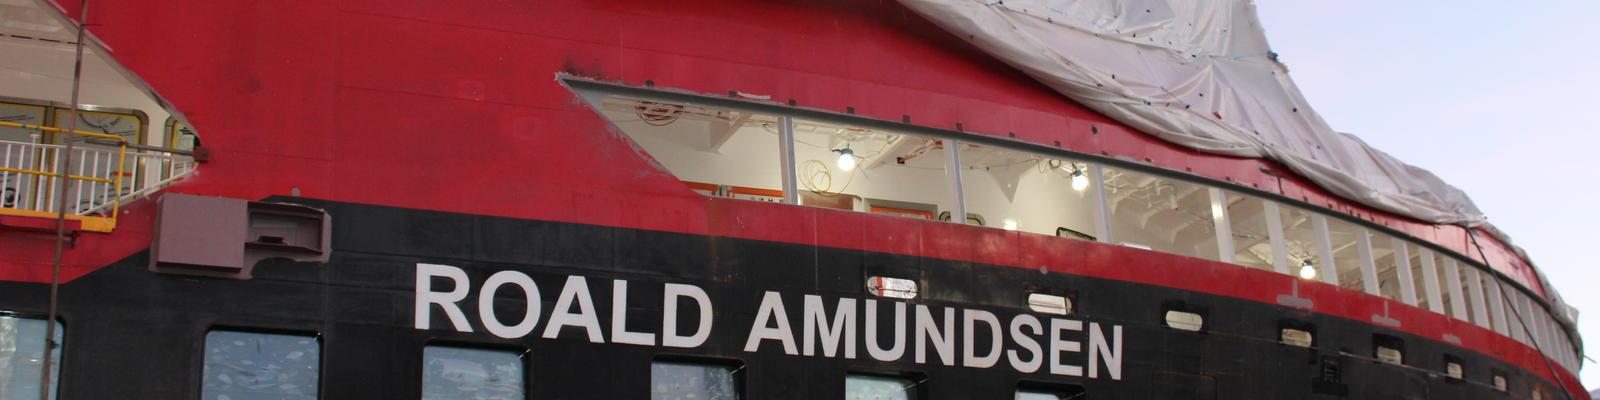 Roald Amundsen (Photo: Sarah Holt/Cruise Critic contributor)